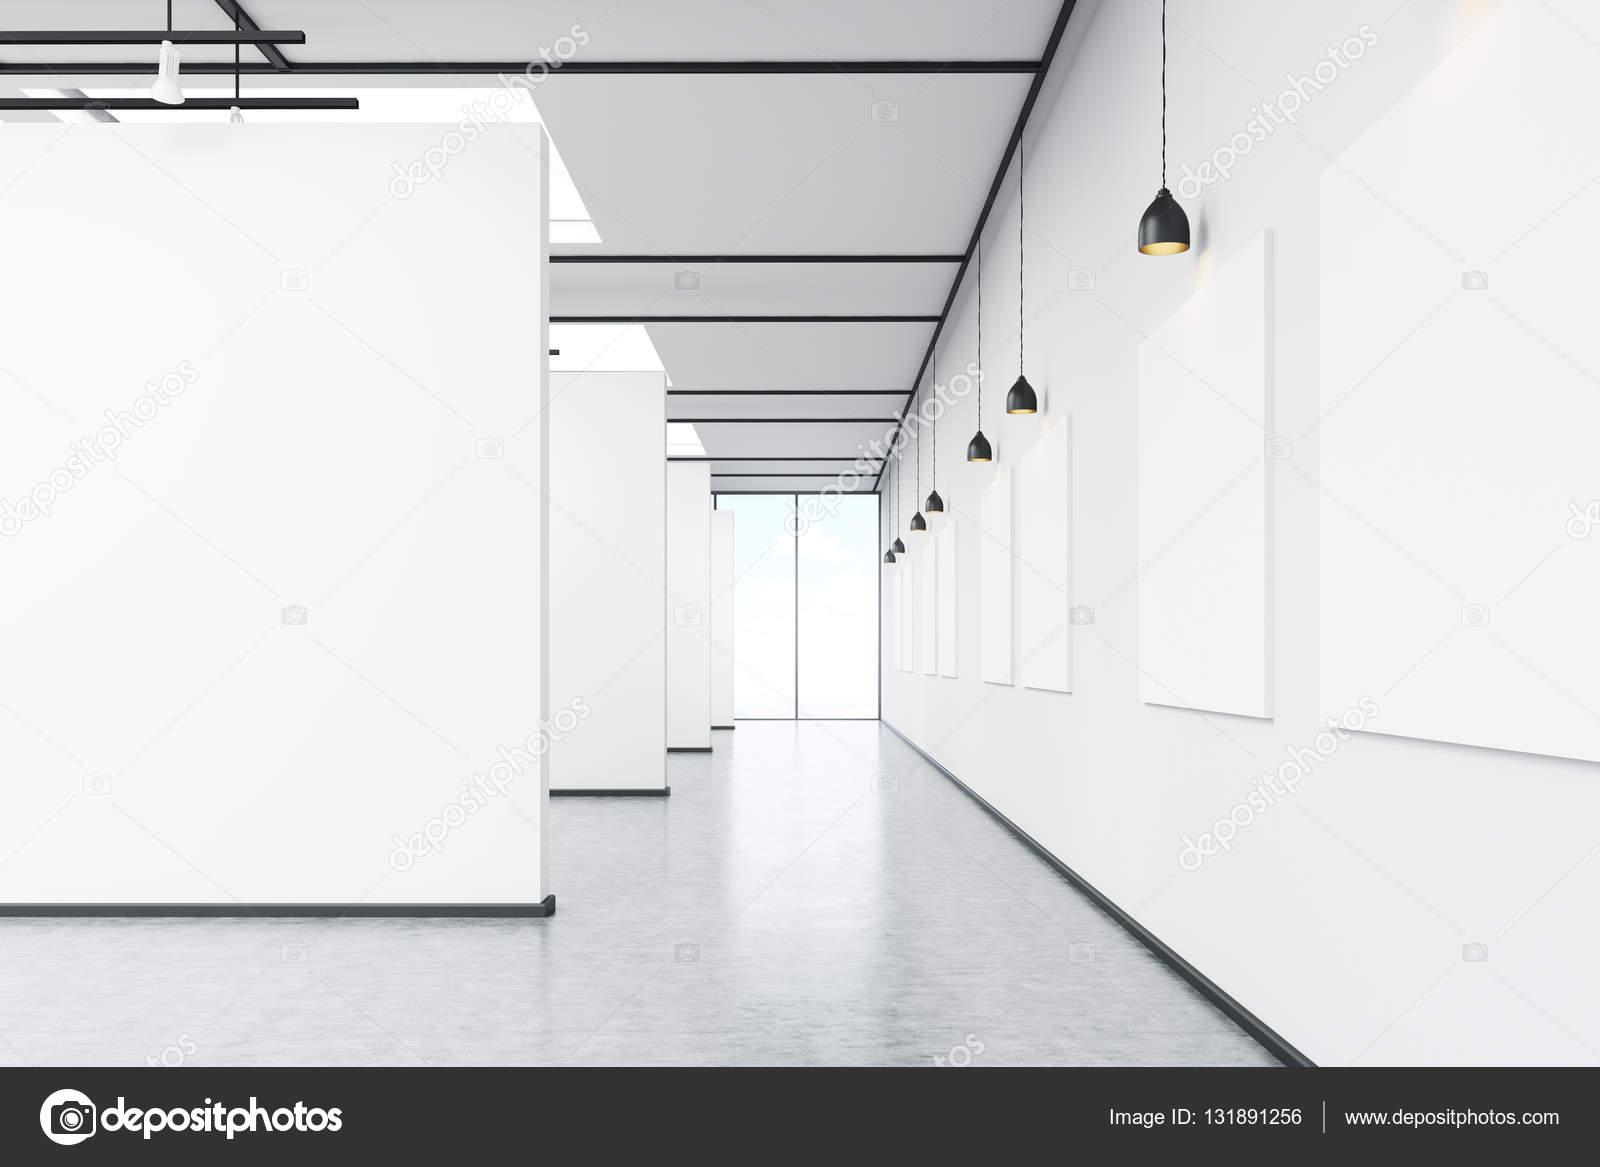 Kunst galerij corridor u2014 stockfoto © denisismagilov #131891256